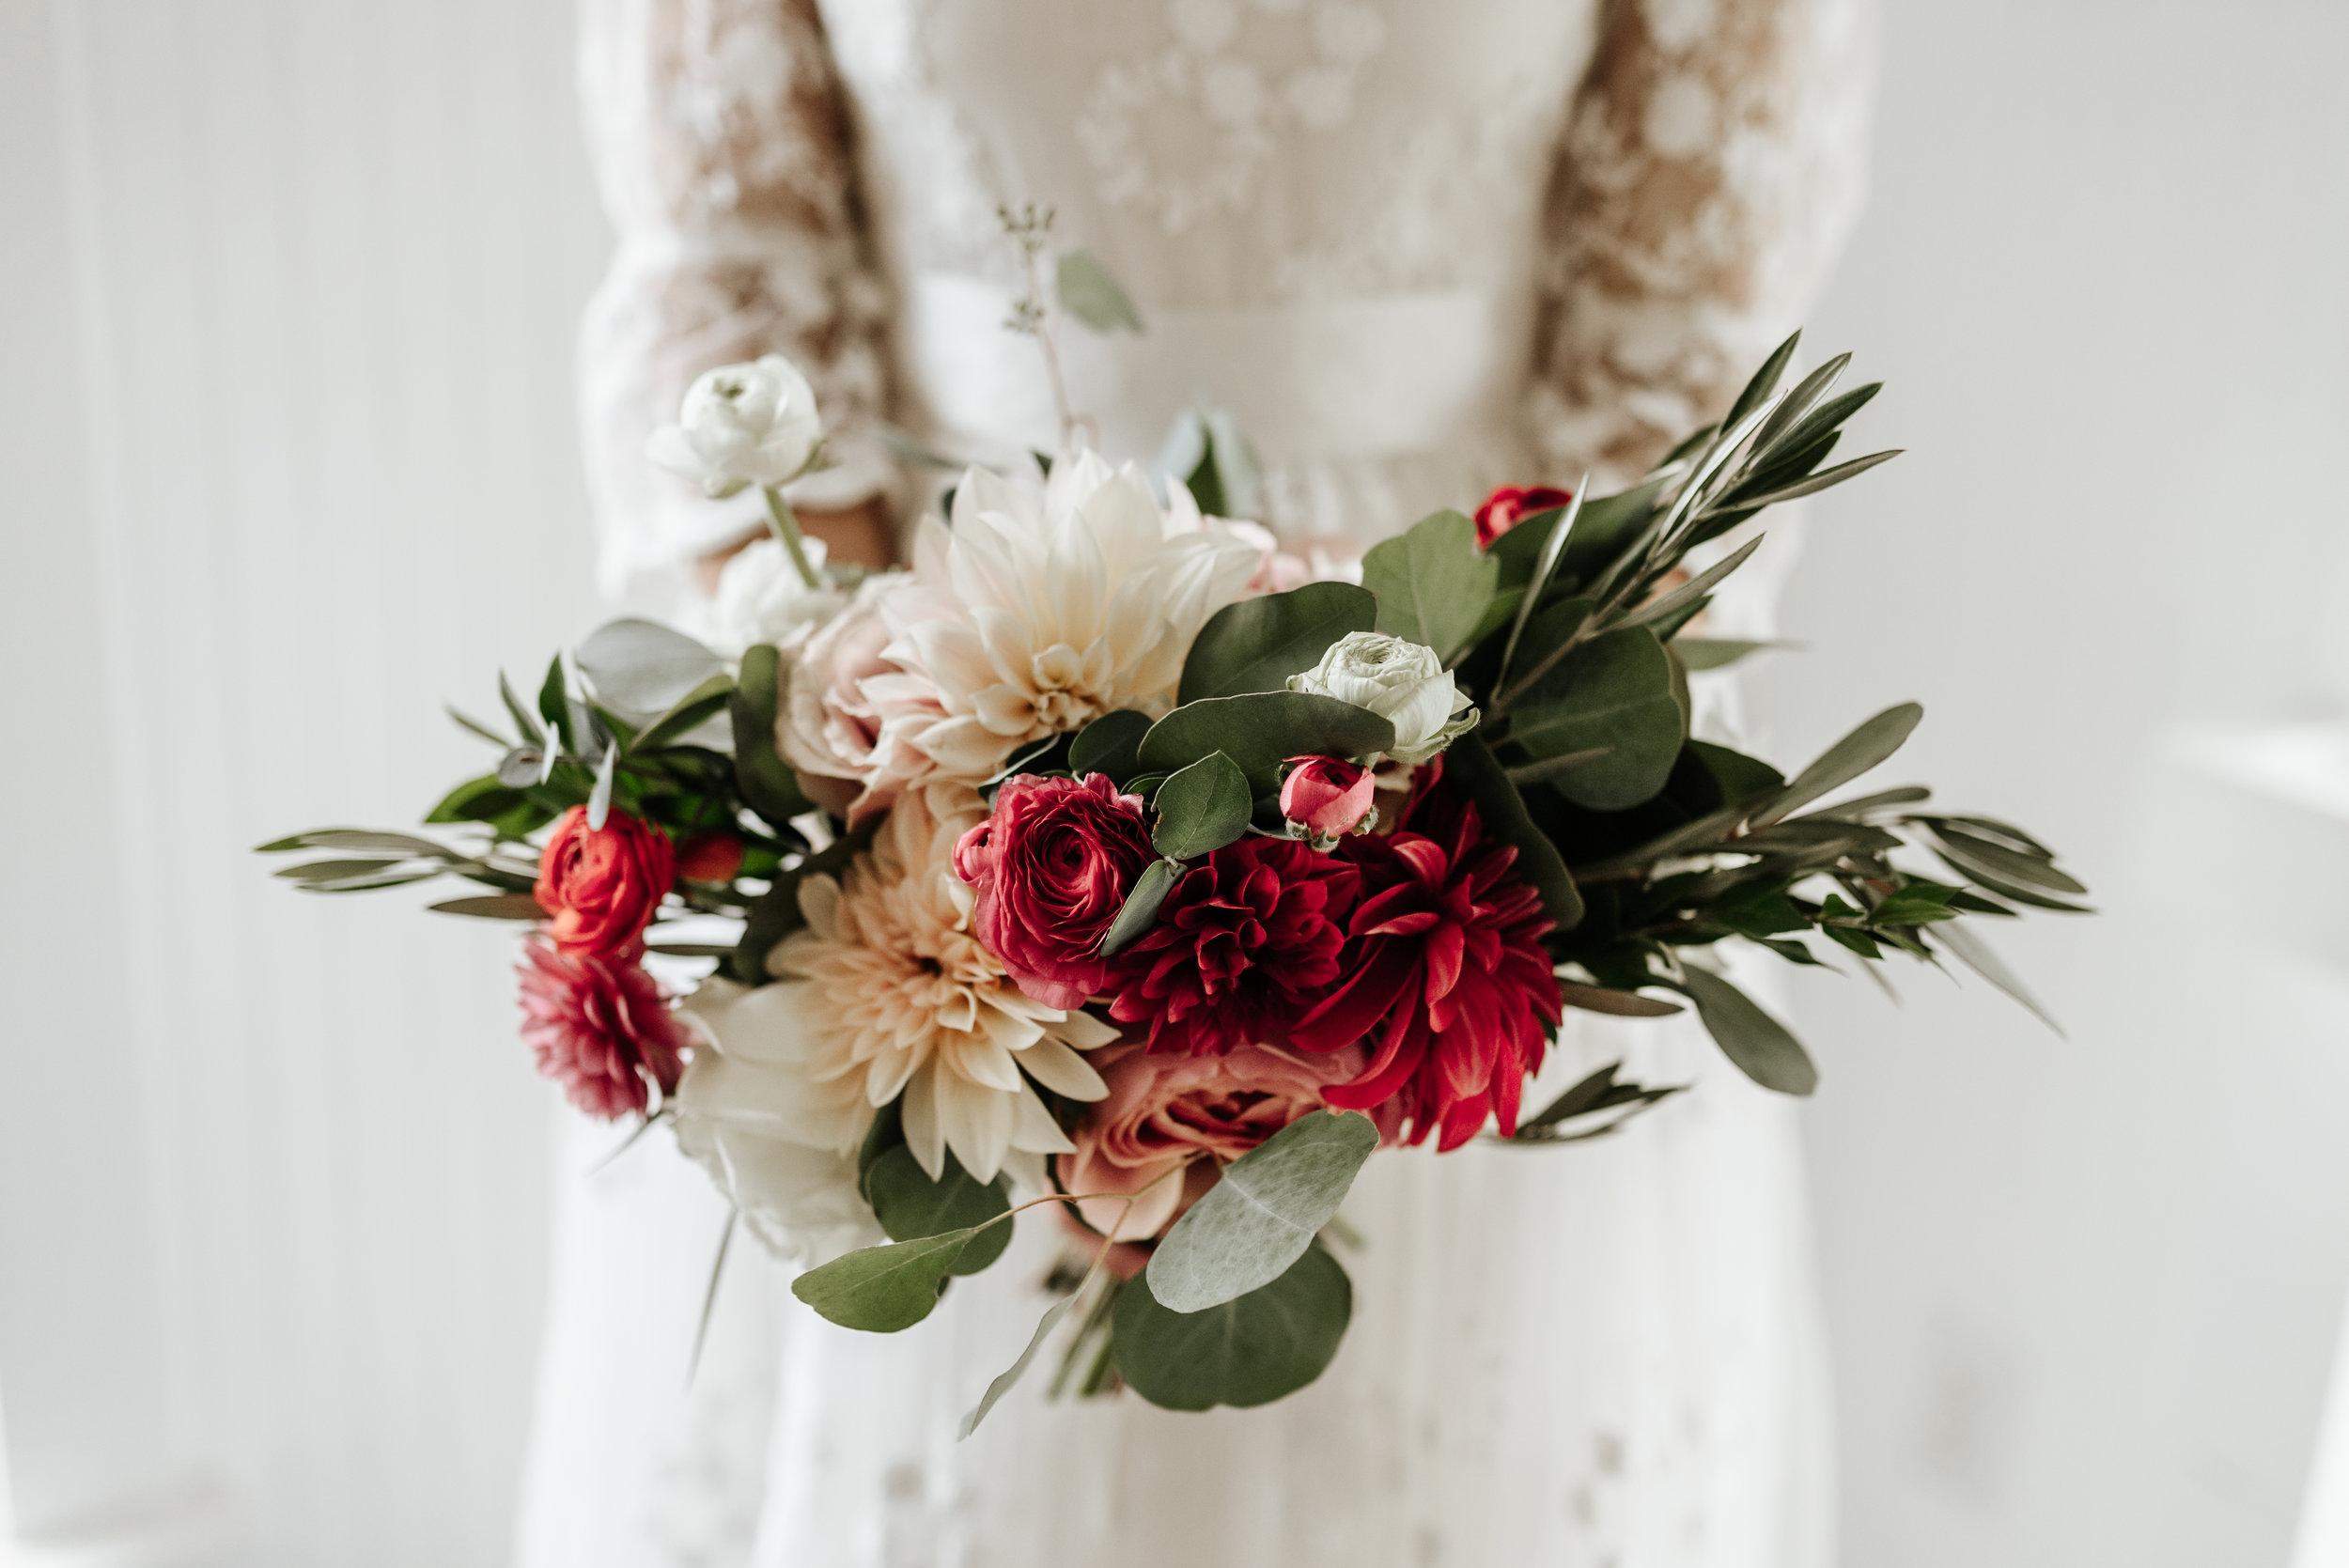 Veritas-Vineyards-and-Winery-Wedding-Photography-Afton-Virginia-Yasmin-Seth-Photography-by-V-9183.jpg